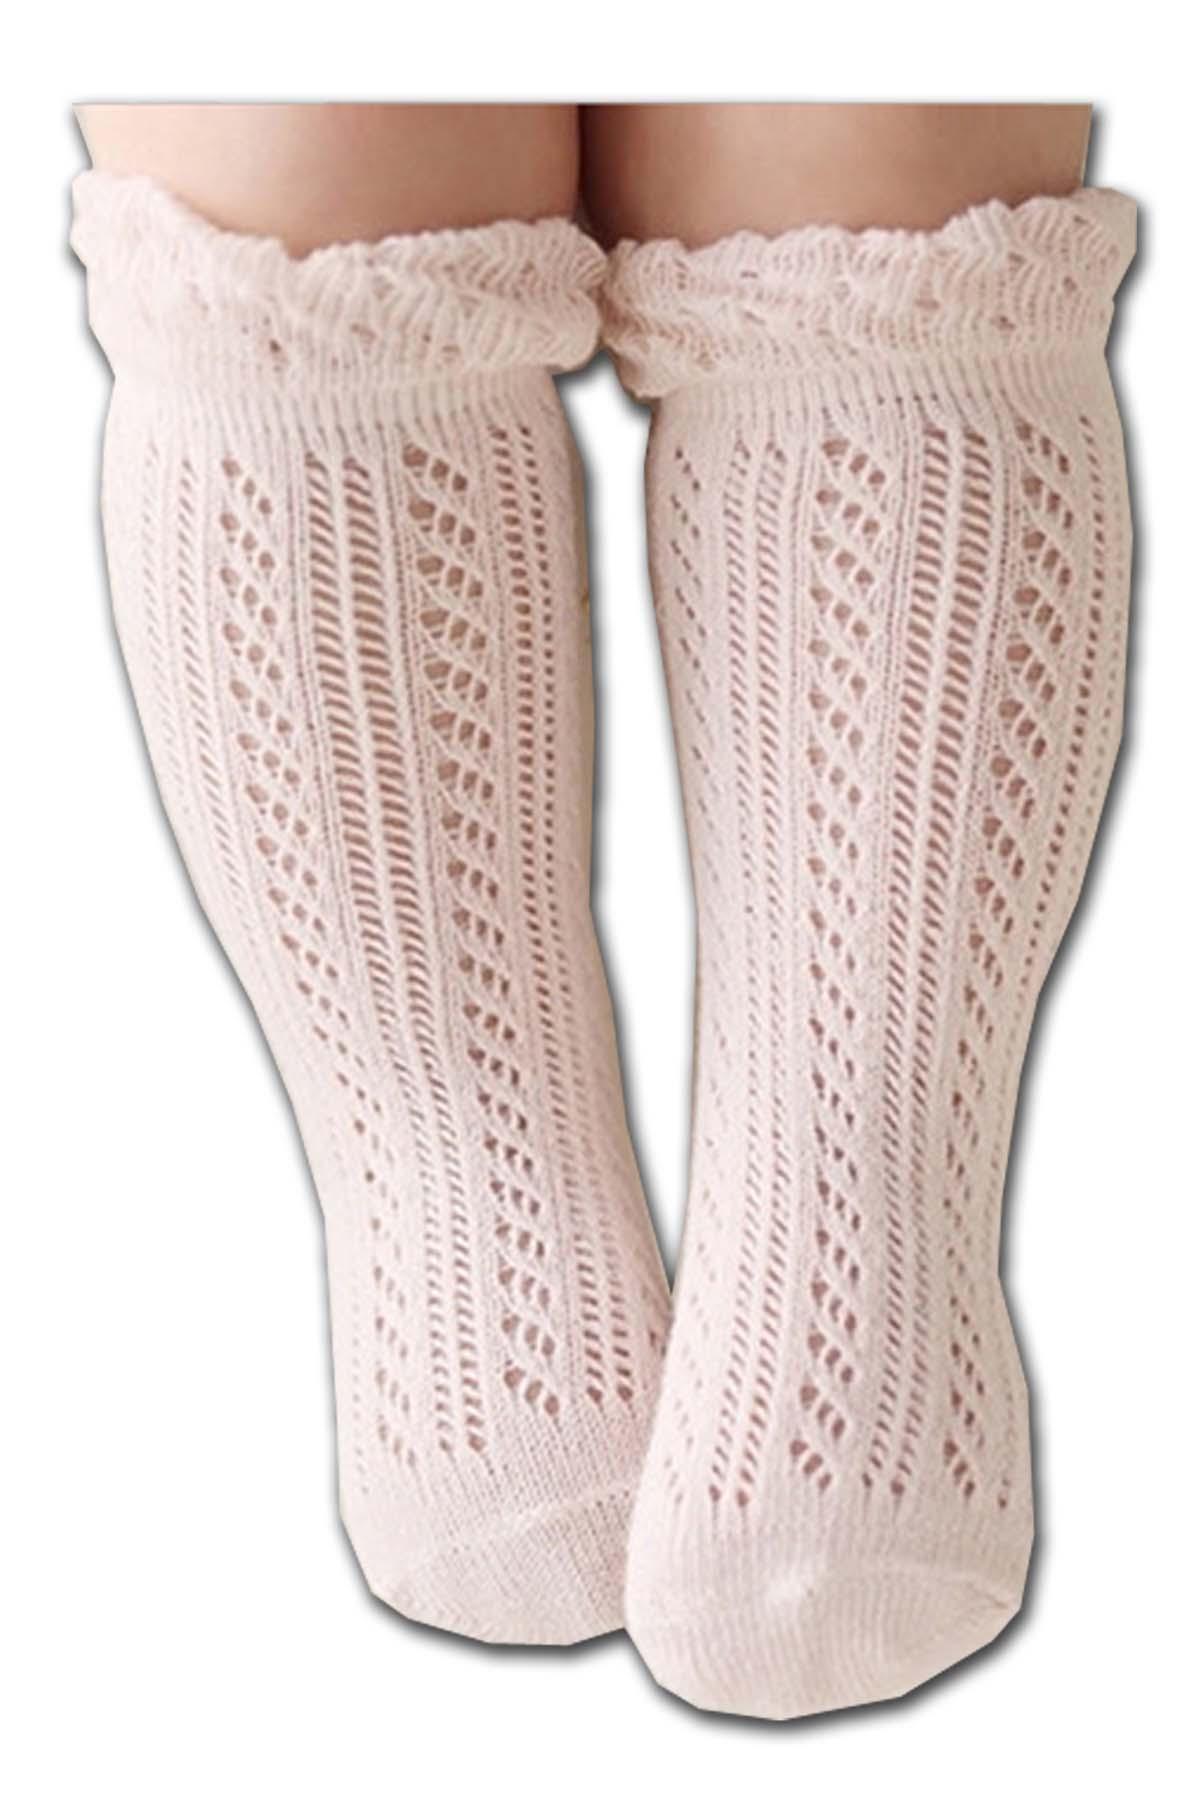 Tiny Holes Baby Socks Light Pink end 3 31 2020 9 40 AM